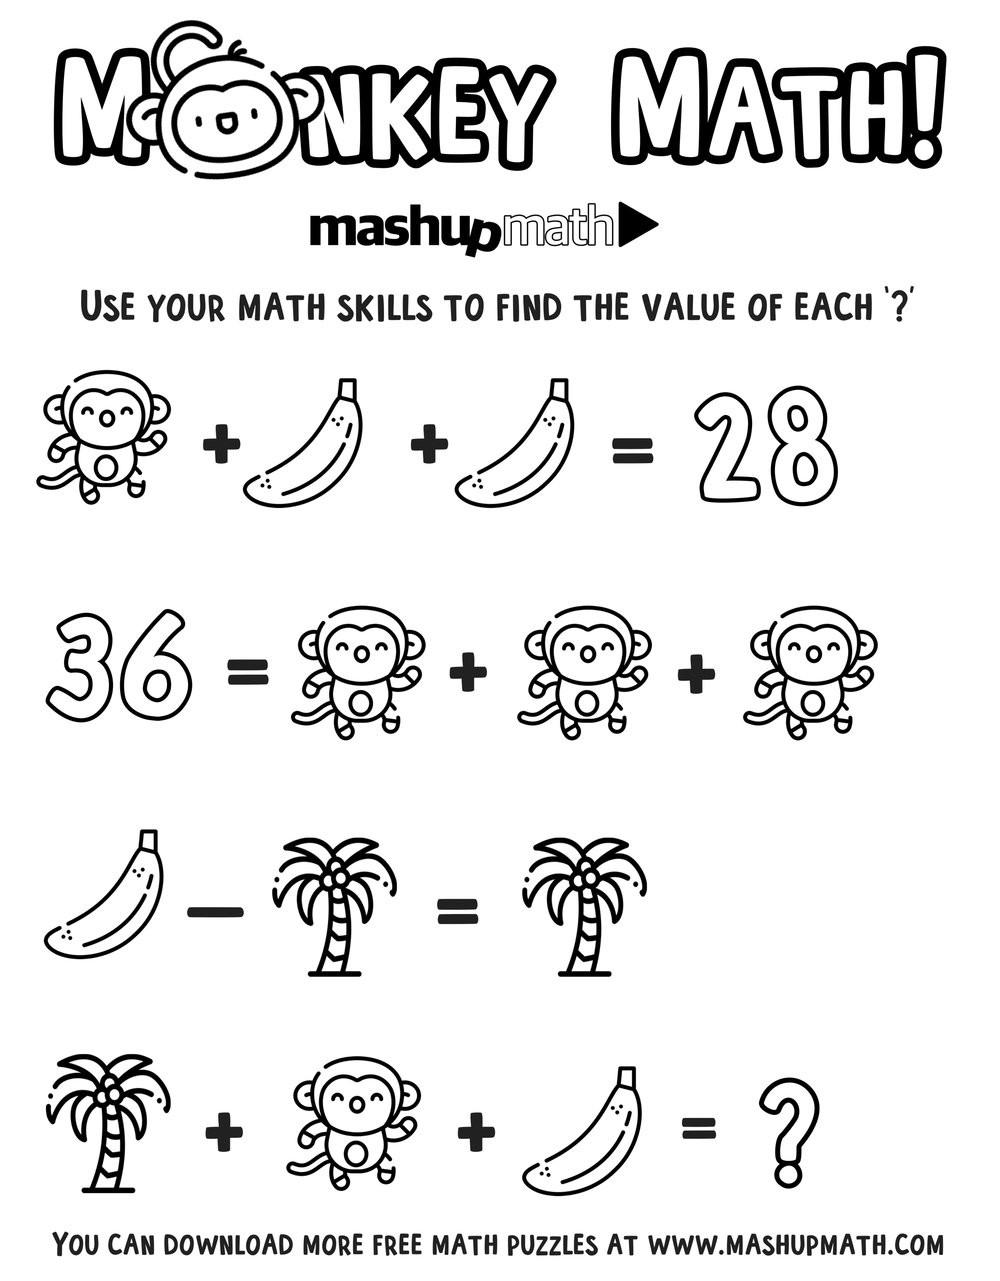 6th Grade Math Puzzles Free Math Coloring Worksheets for 5th and 6th Grade — Mashup